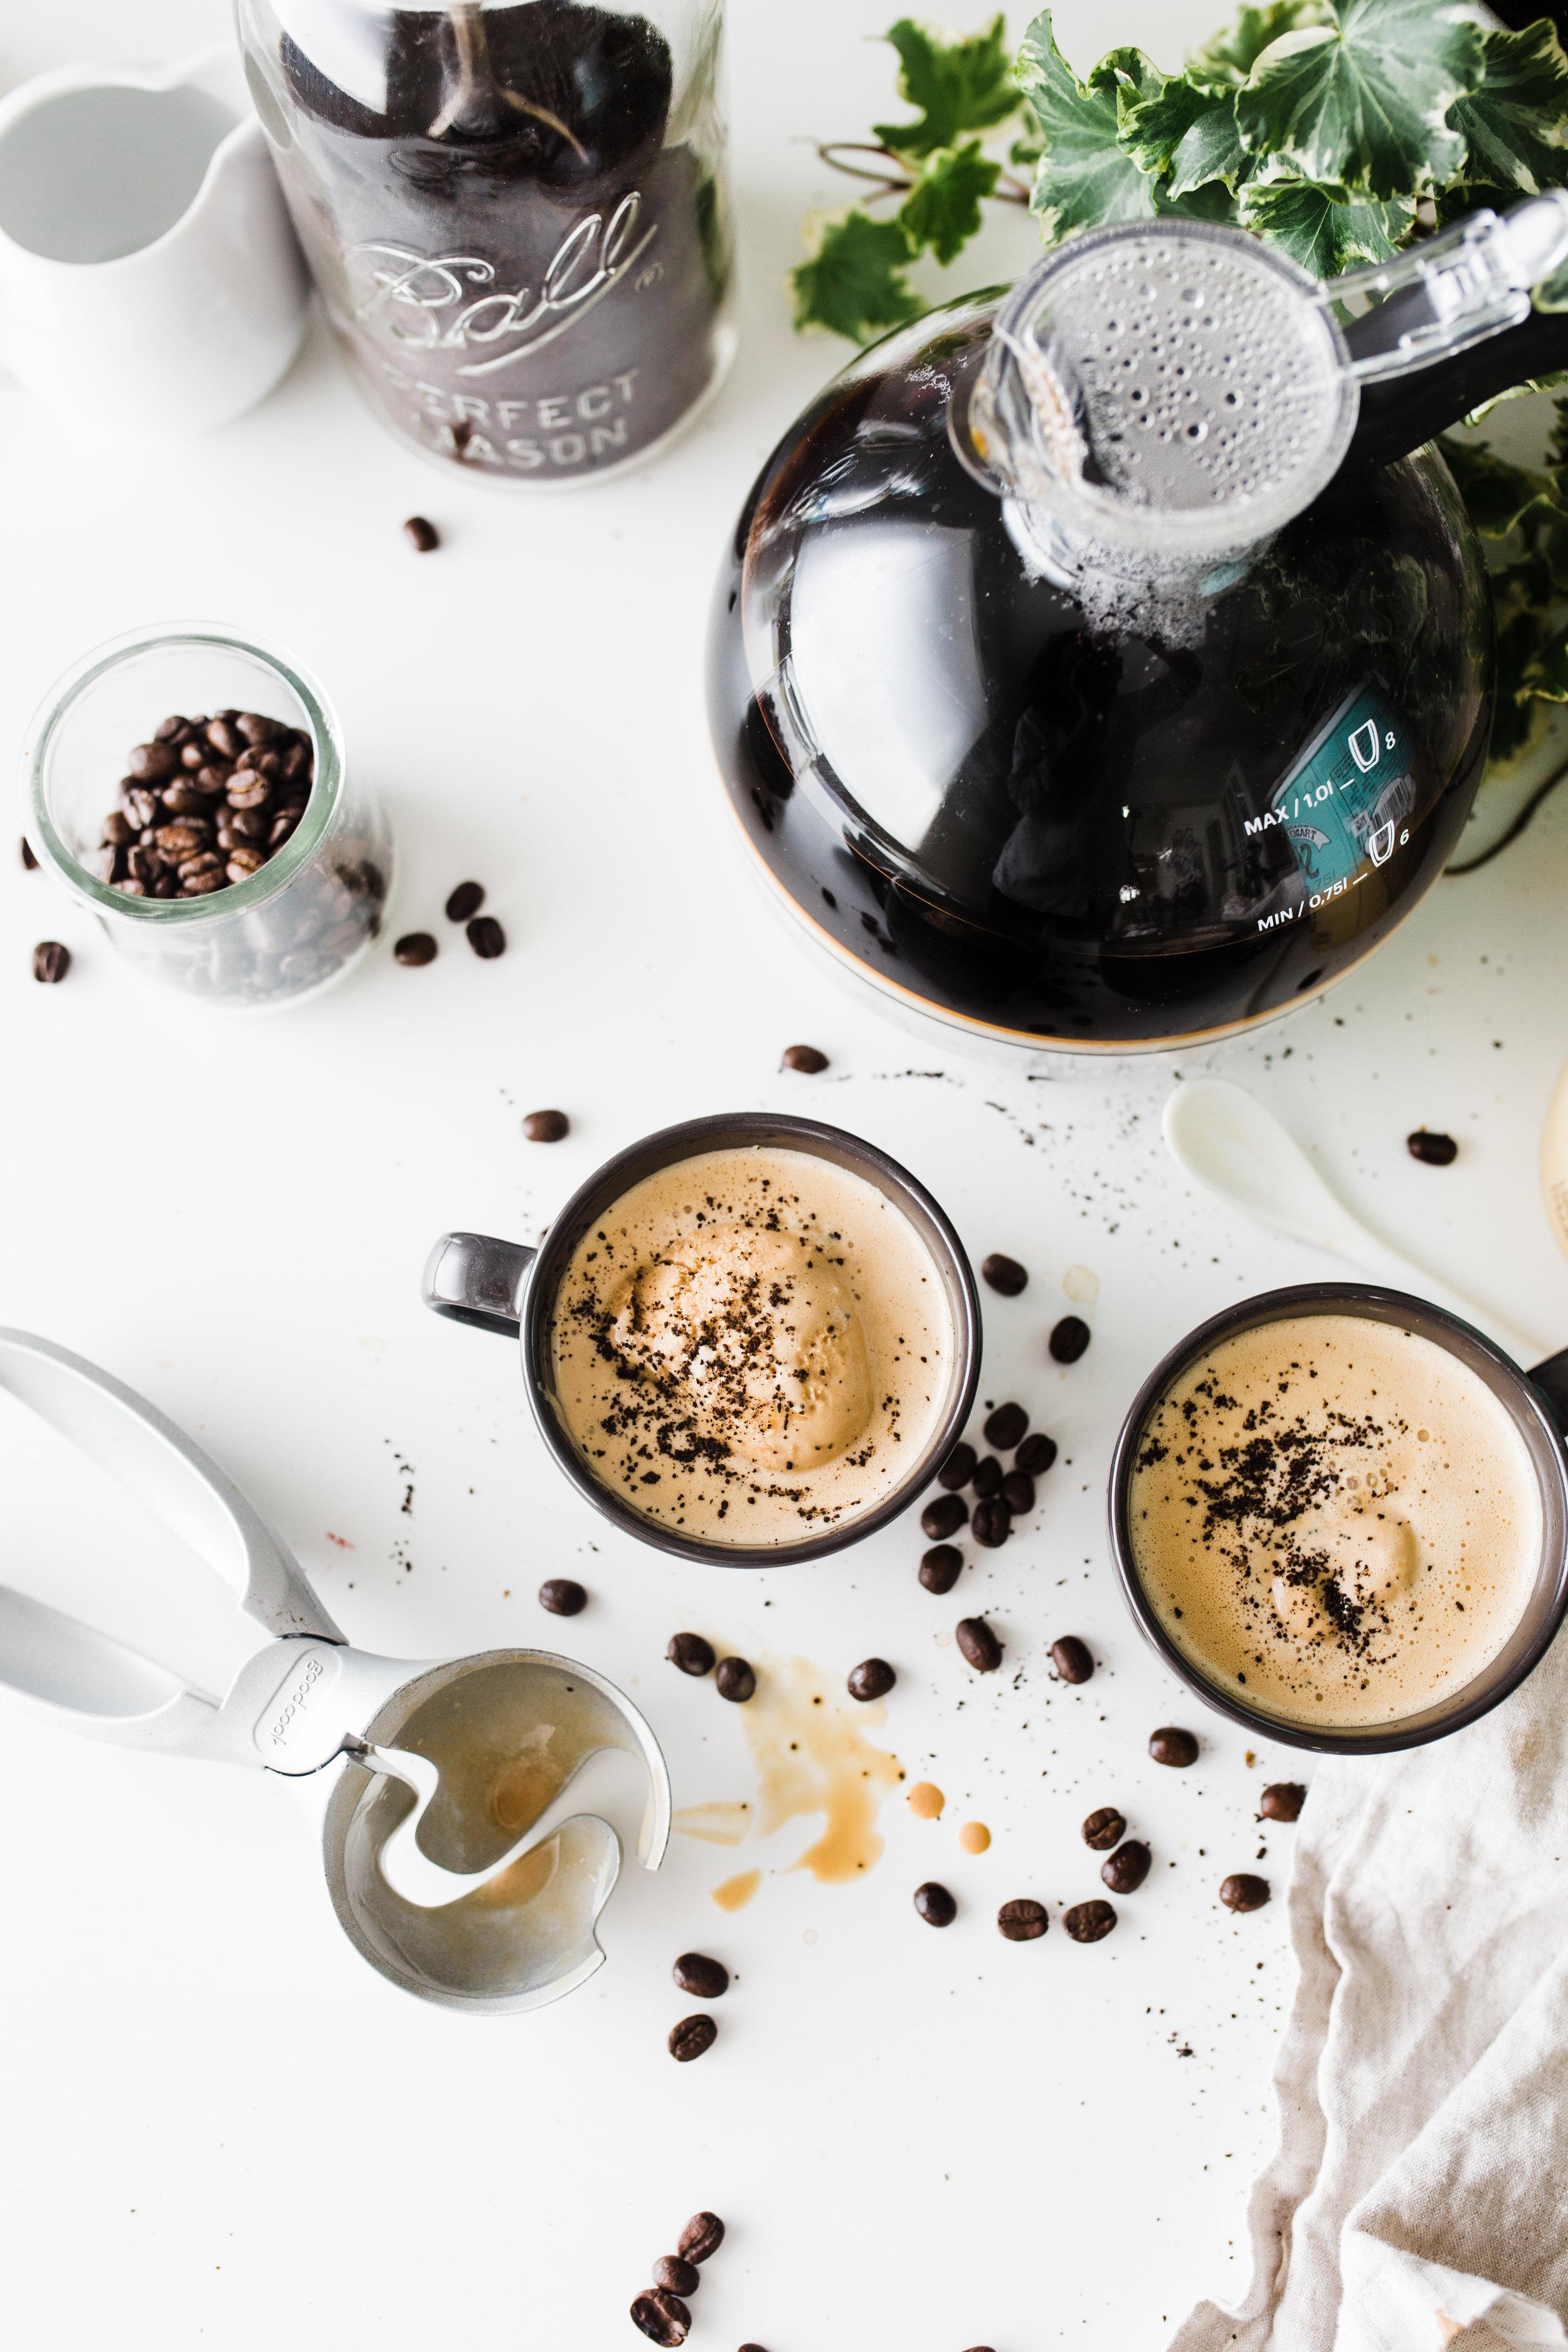 2018-02 IHA COFFEE - Vaccum - Salted Caramel Affogato 14.jpg